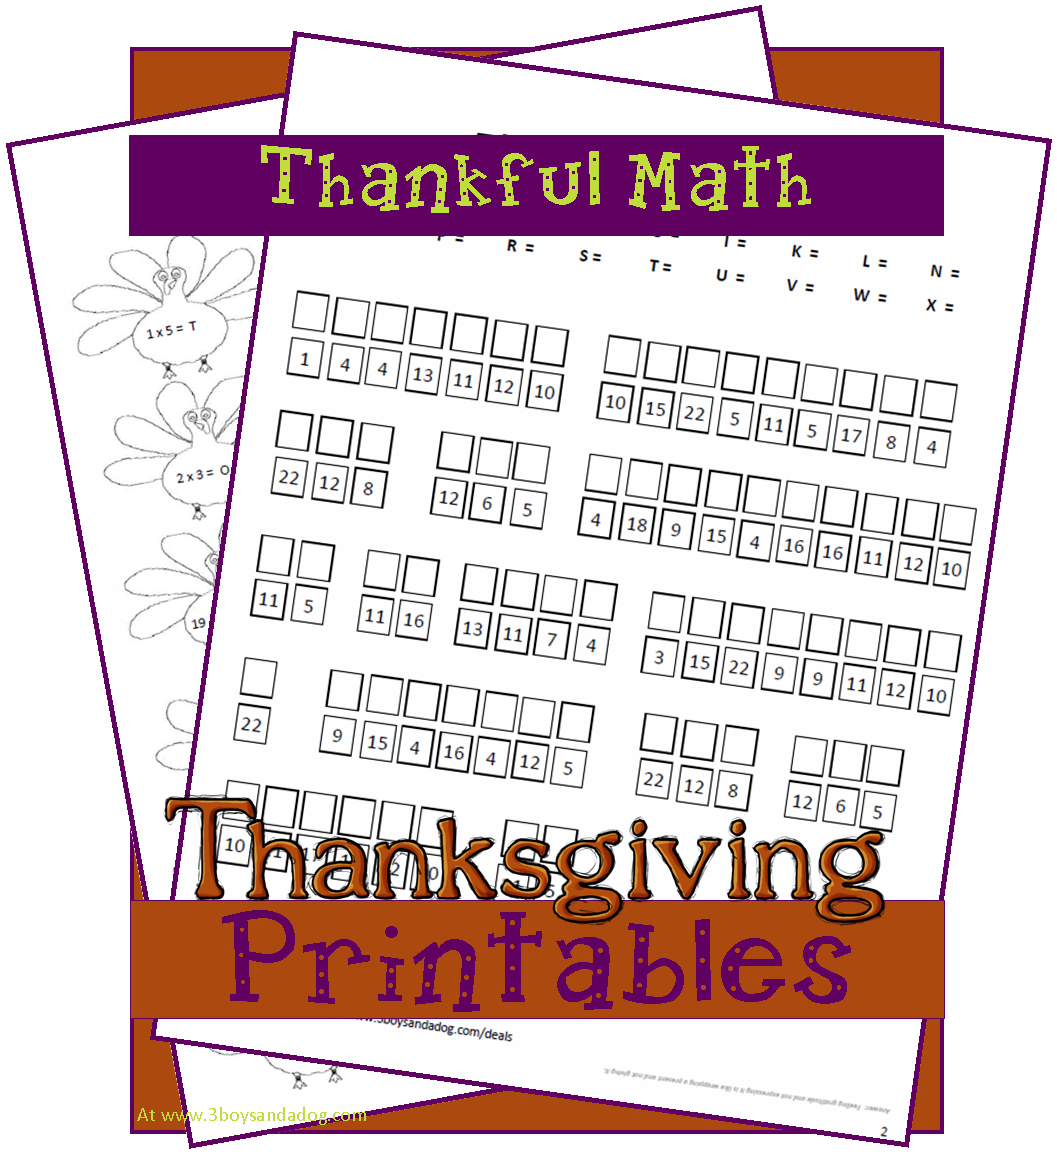 Free Homeschool Printable Thankful Math Reader Request